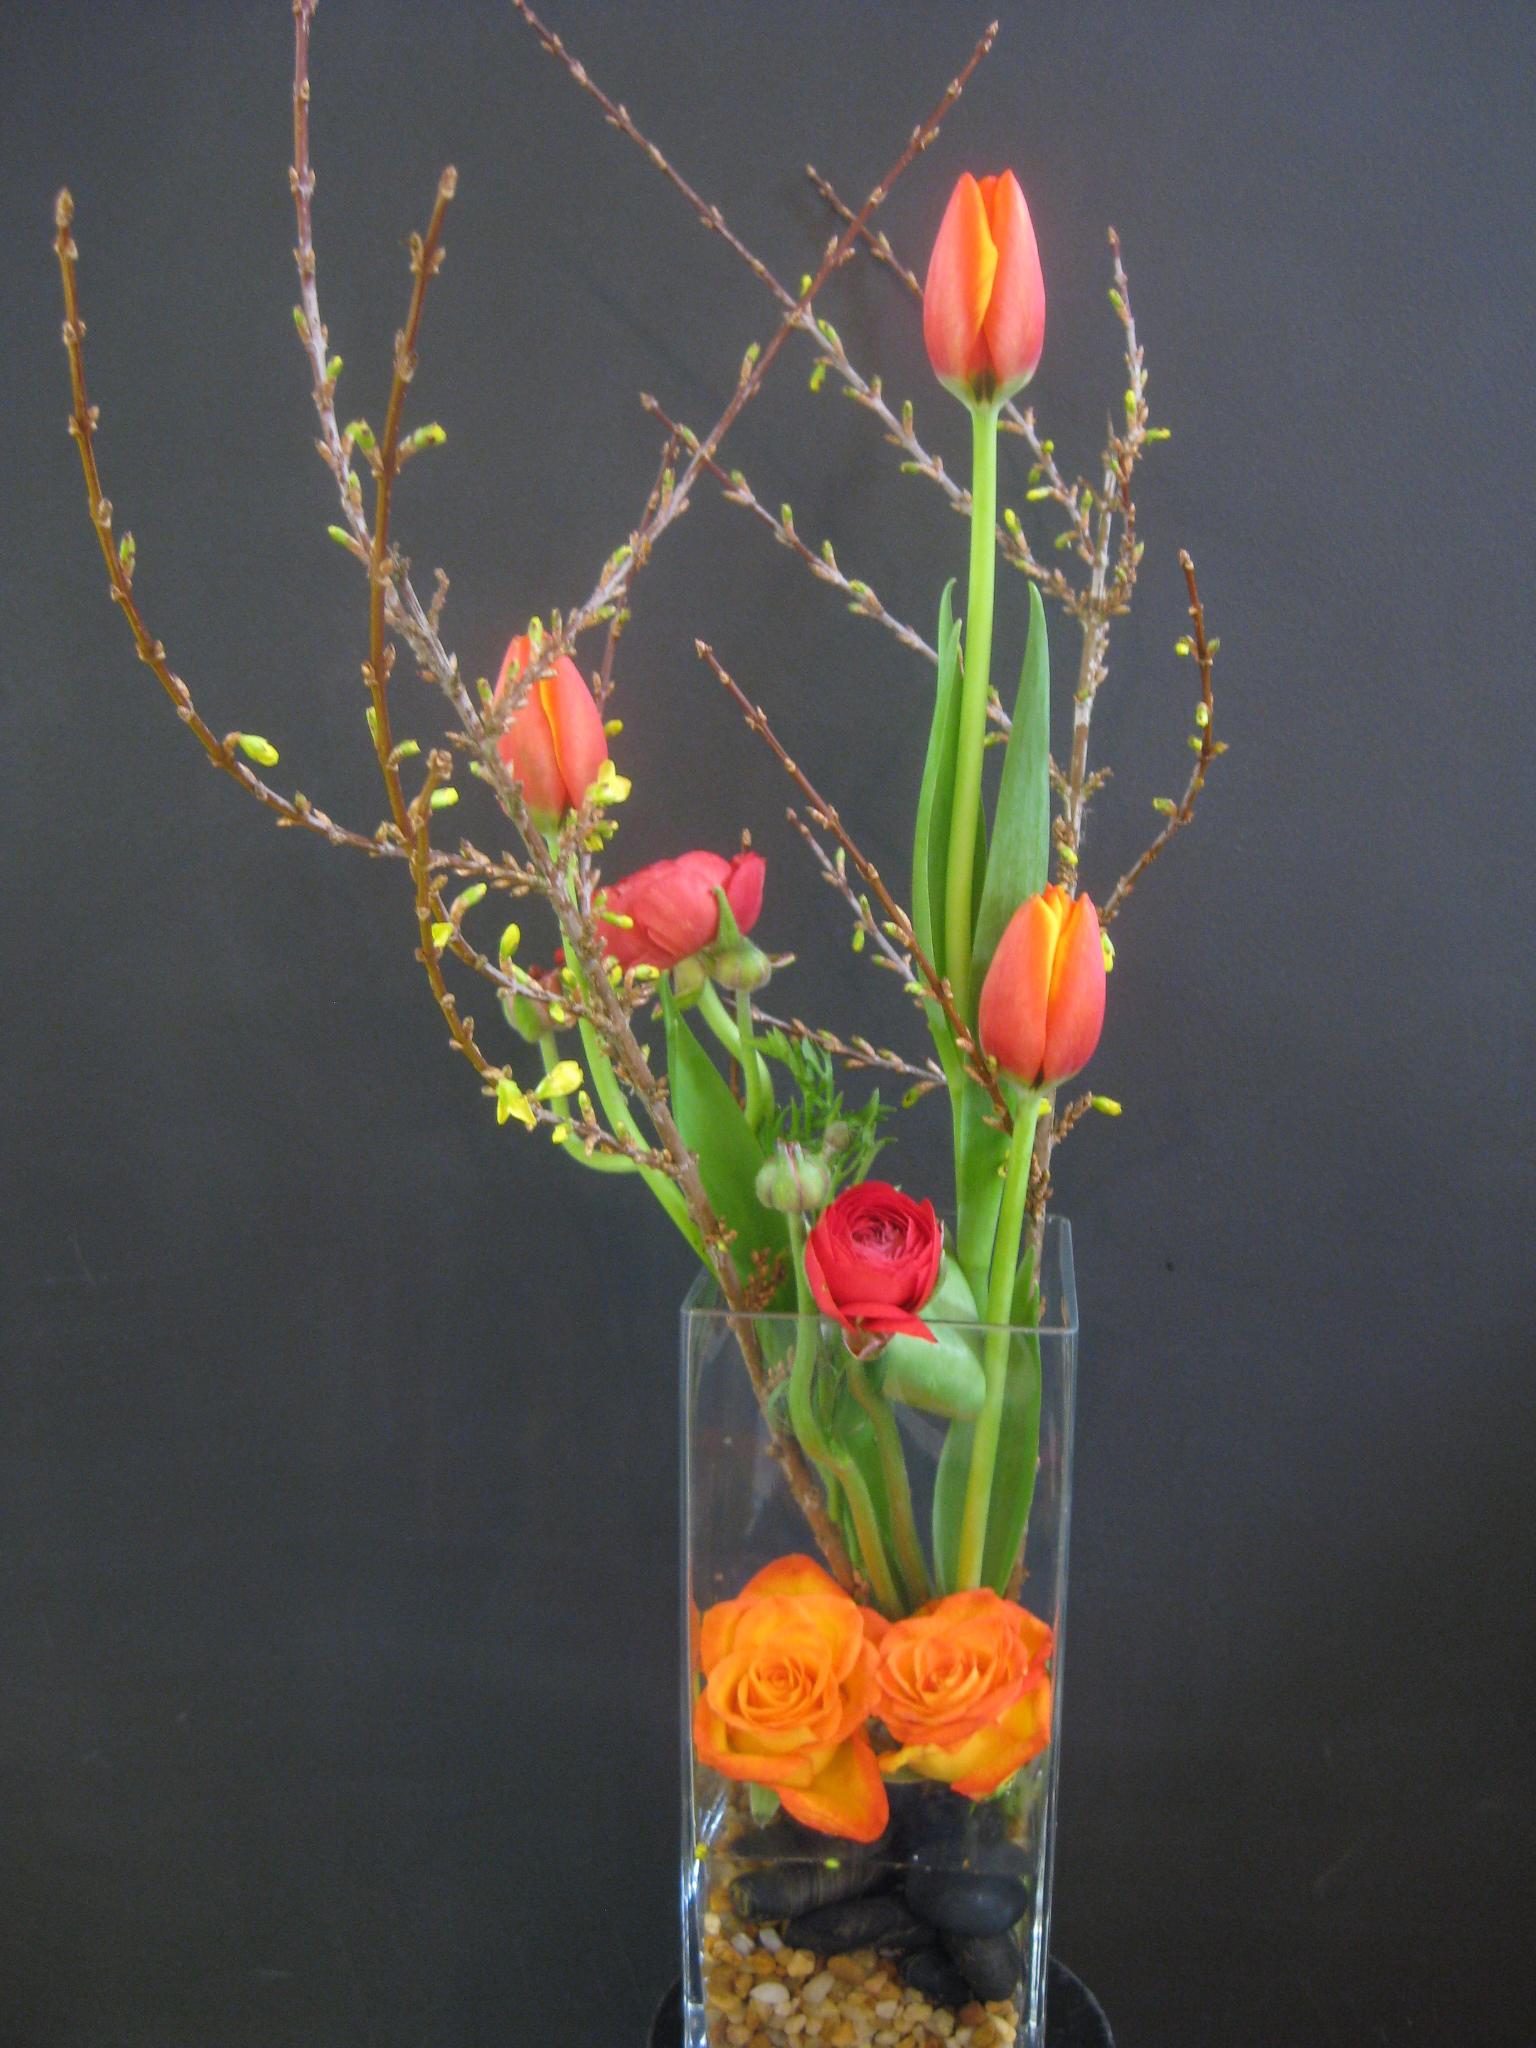 Modern Flower Design Dandelions Flowers Amp Gifts